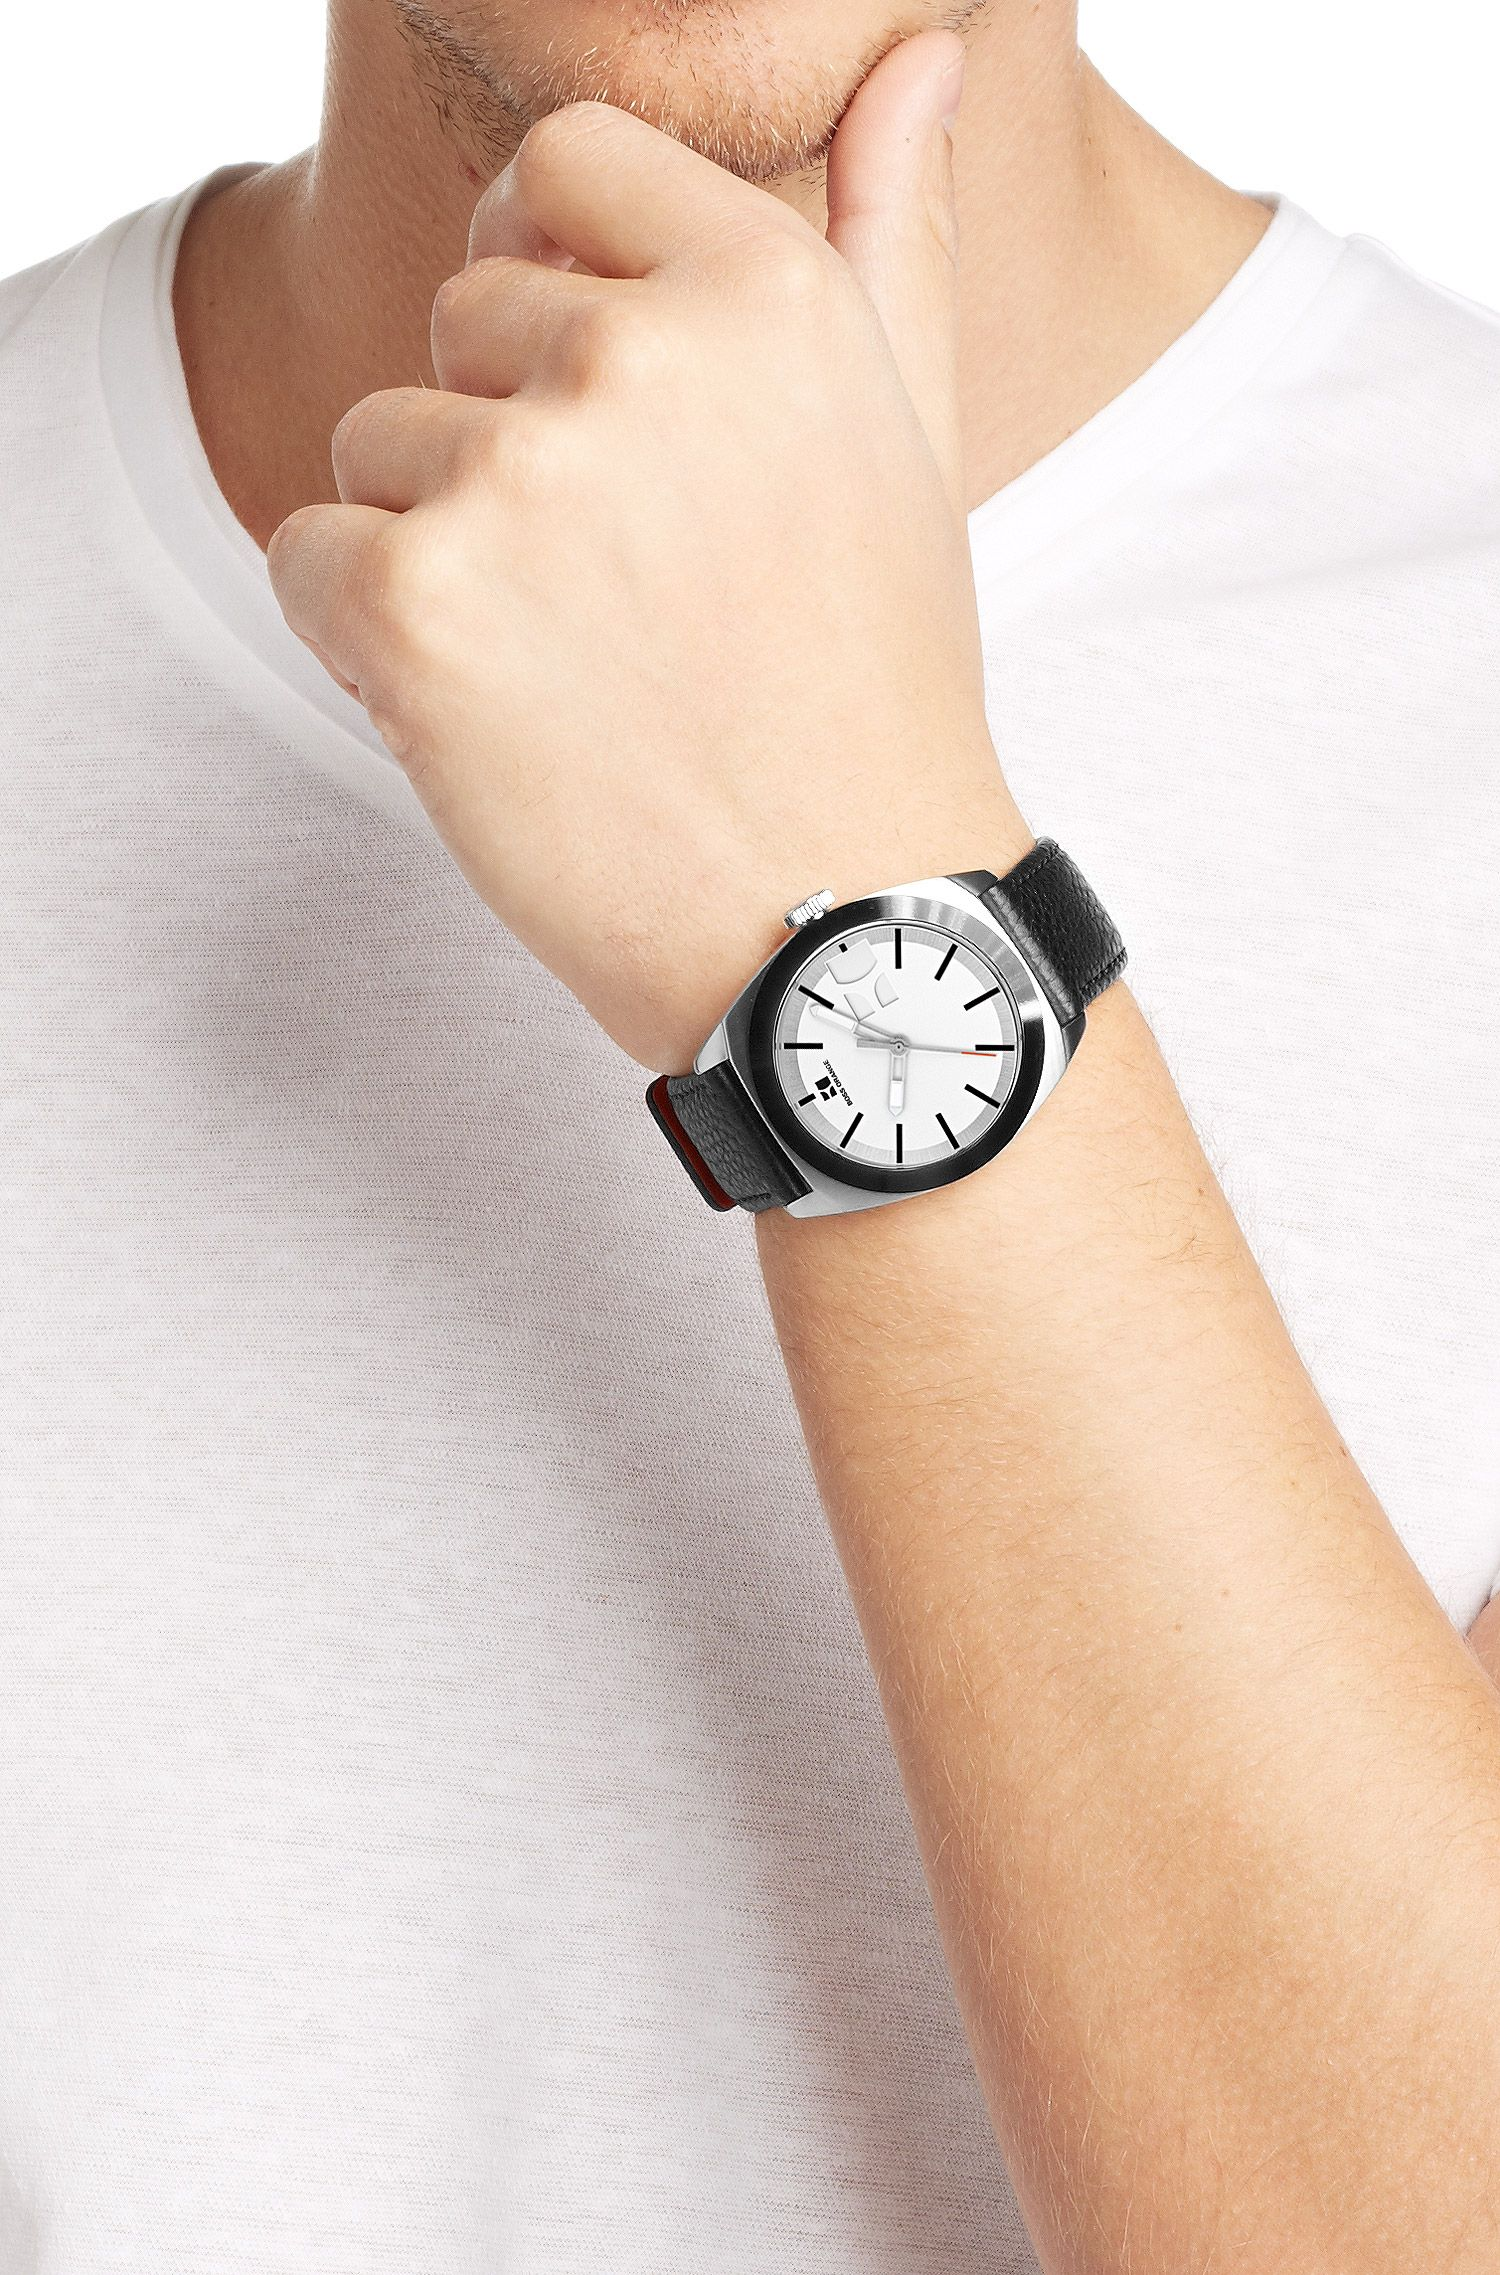 Montre-bracelet «HO300» avec boîtier en acier inoxydable